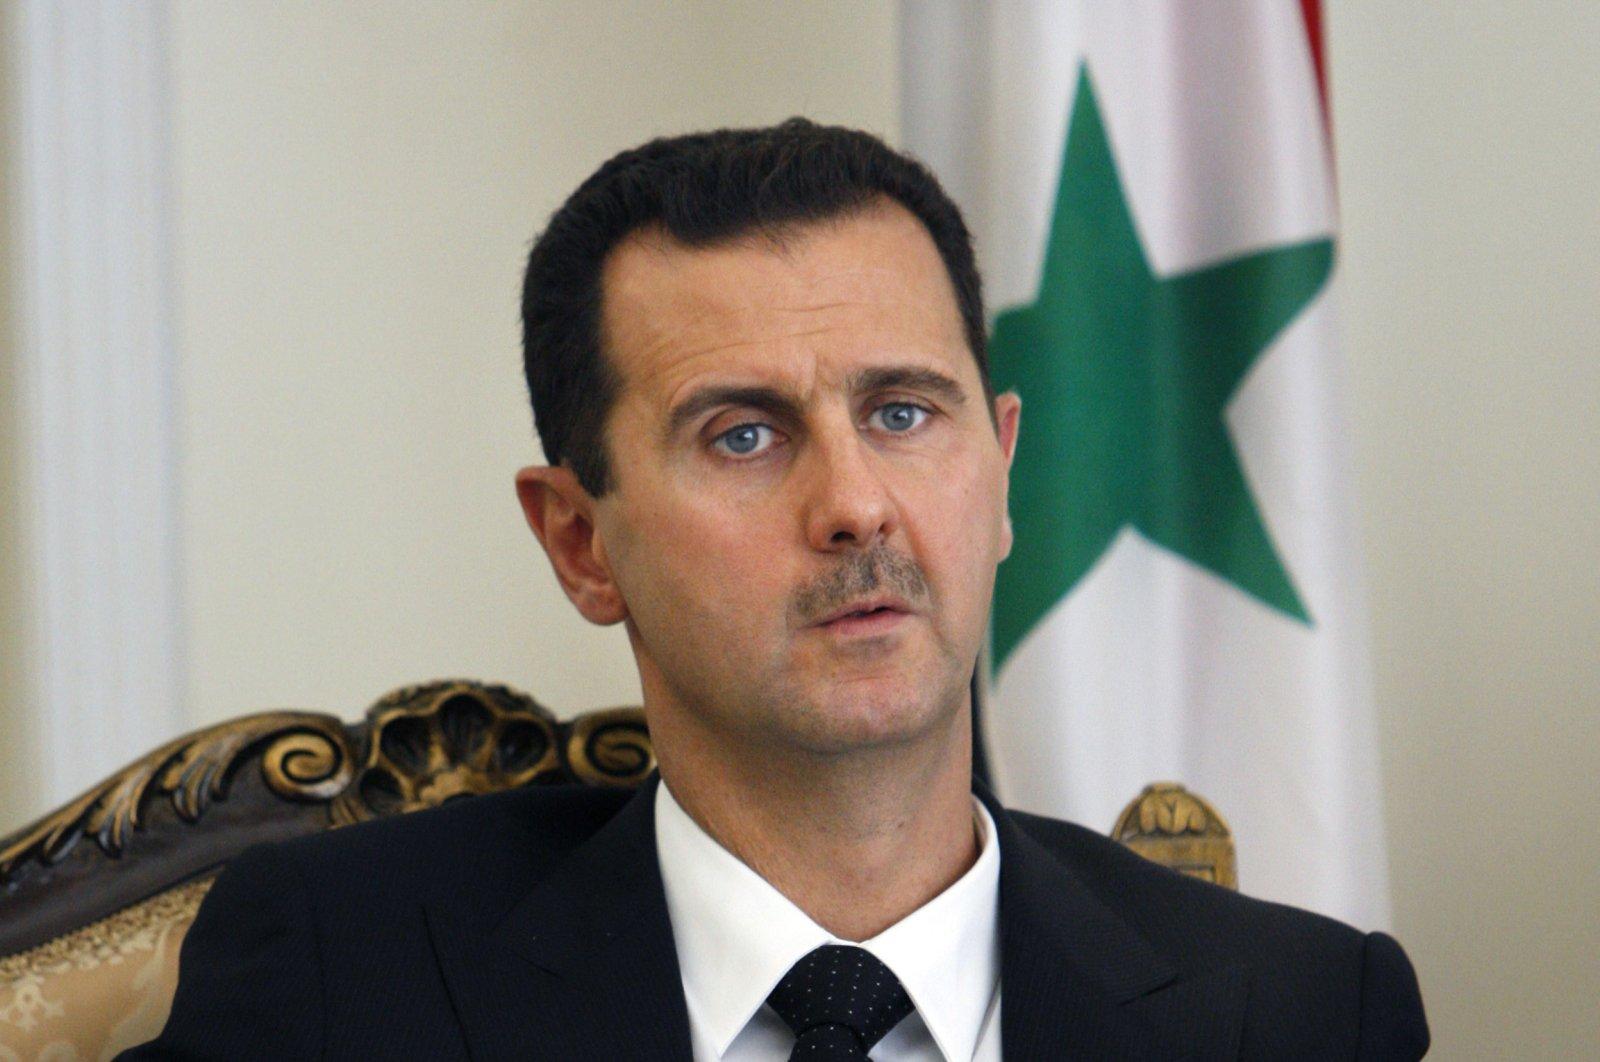 Syrian Bashar Assad during a meeting with his Iranian counterpart Mahmoud Ahmadinejad in Tehran, Iran, Aug. 19, 2009. (AP Photo)